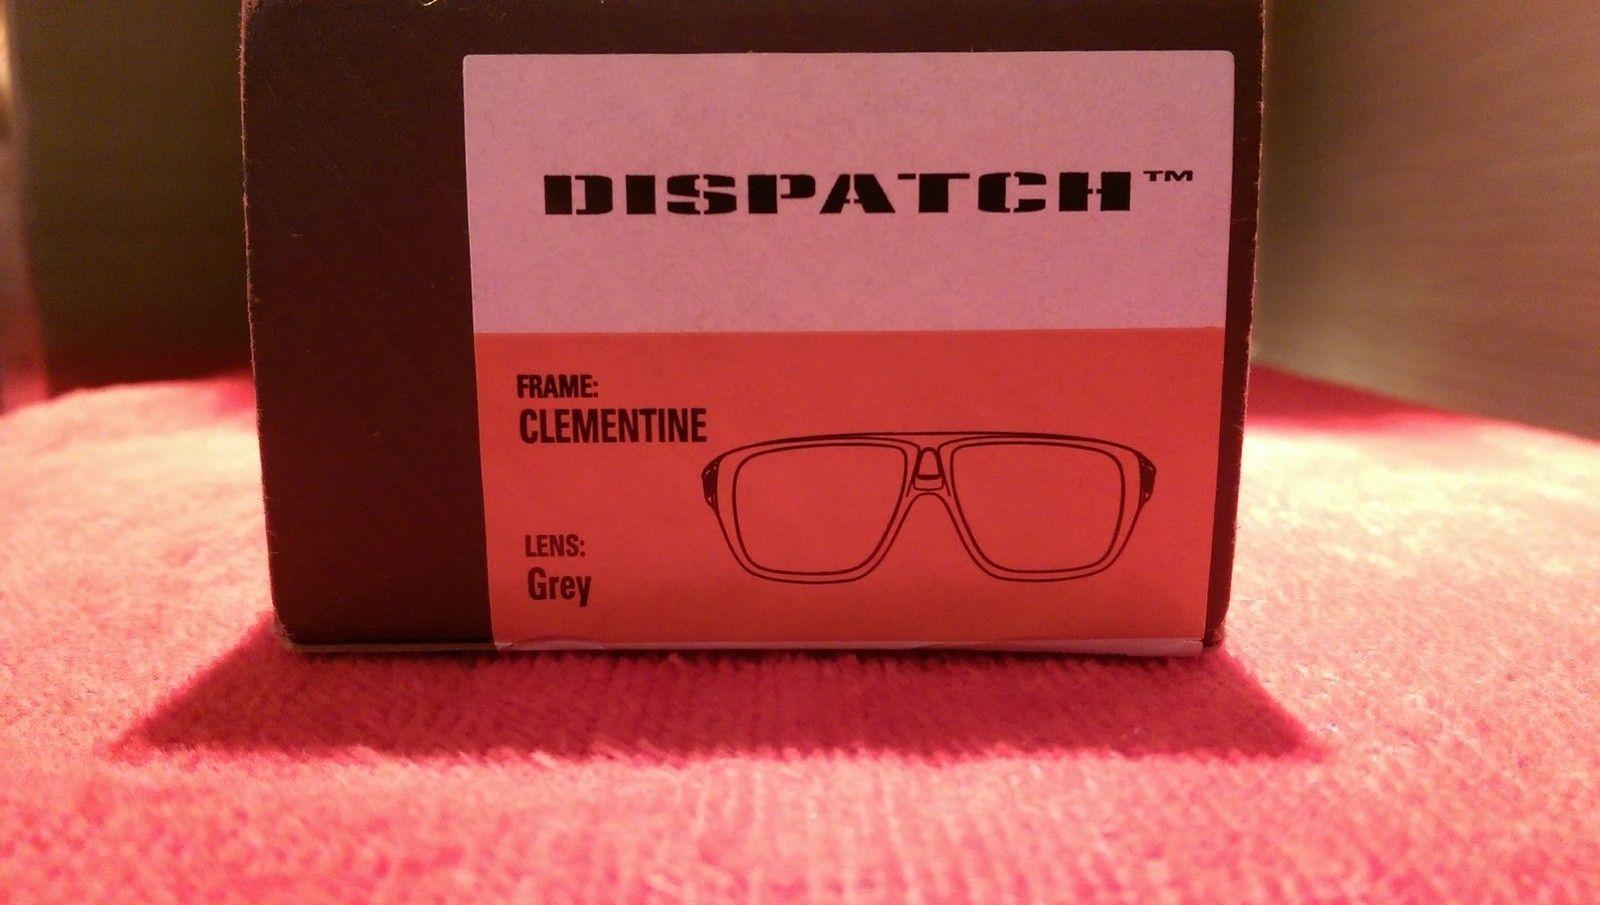 Oakley Dispatch 1 Clementine /Greyoo9090-06 BNIB - IMAG4828.jpg